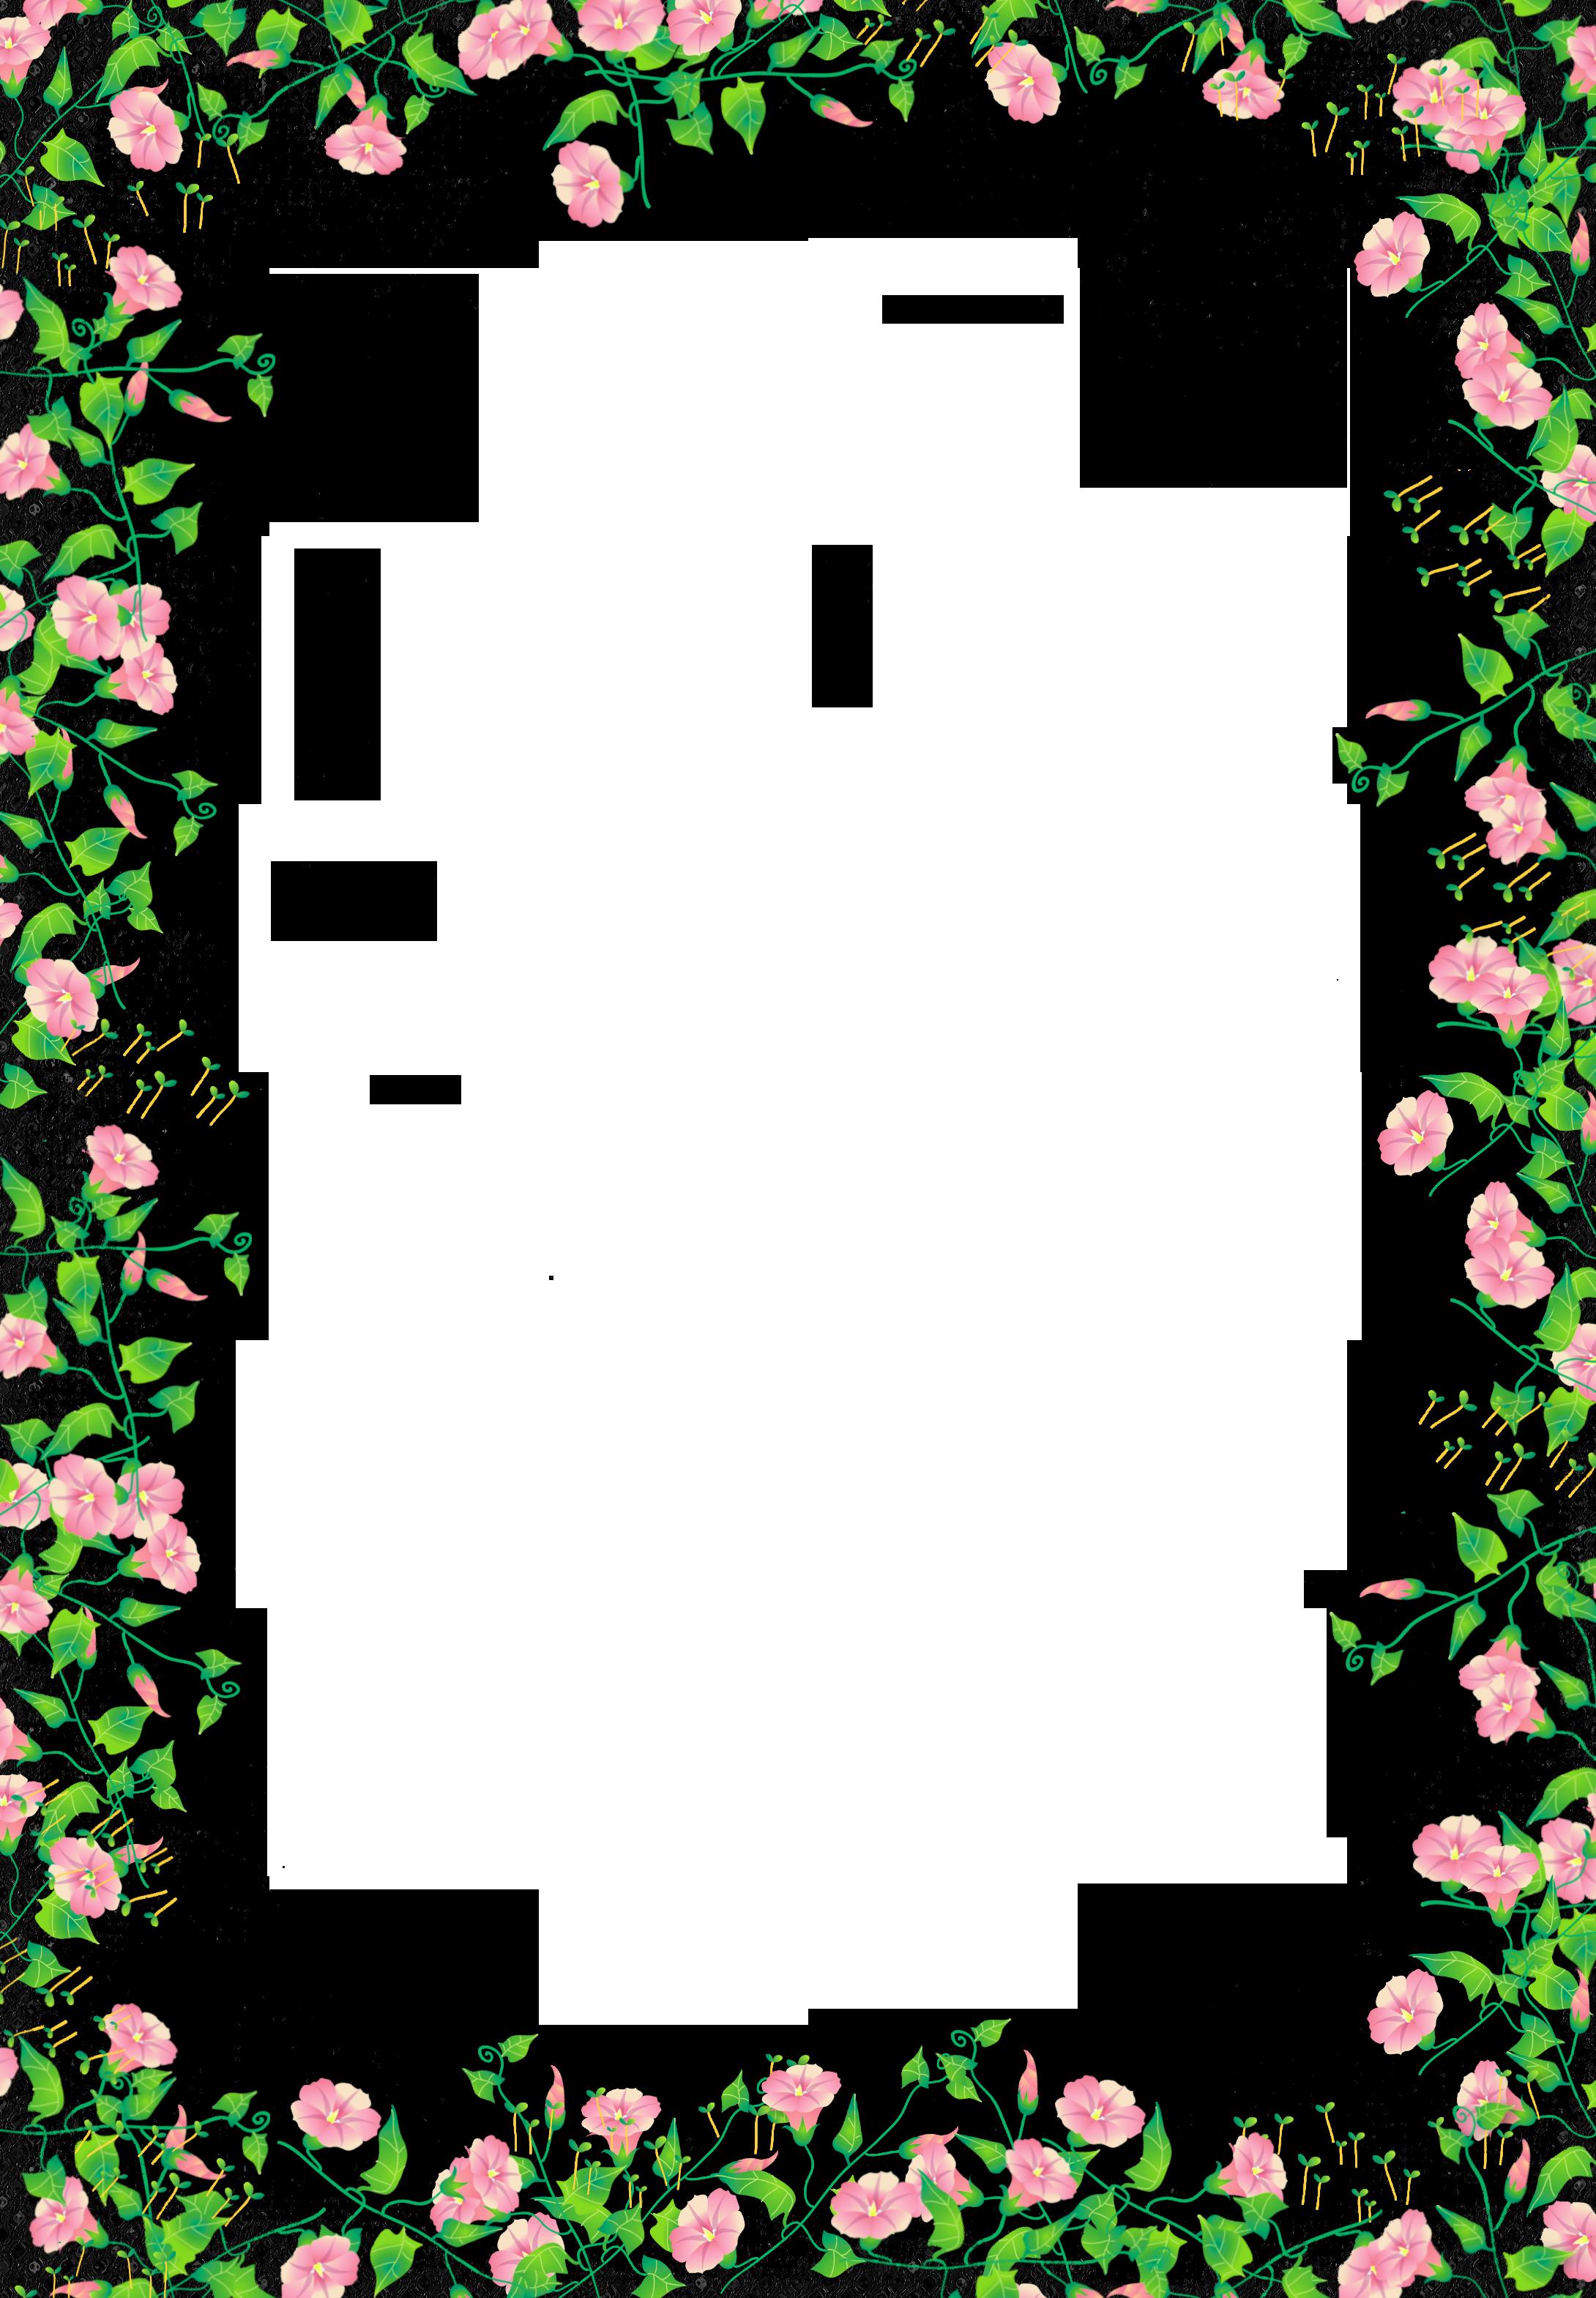 Pin By Beata Garus On Ozdobniki Transparent Flowers Flower Frame